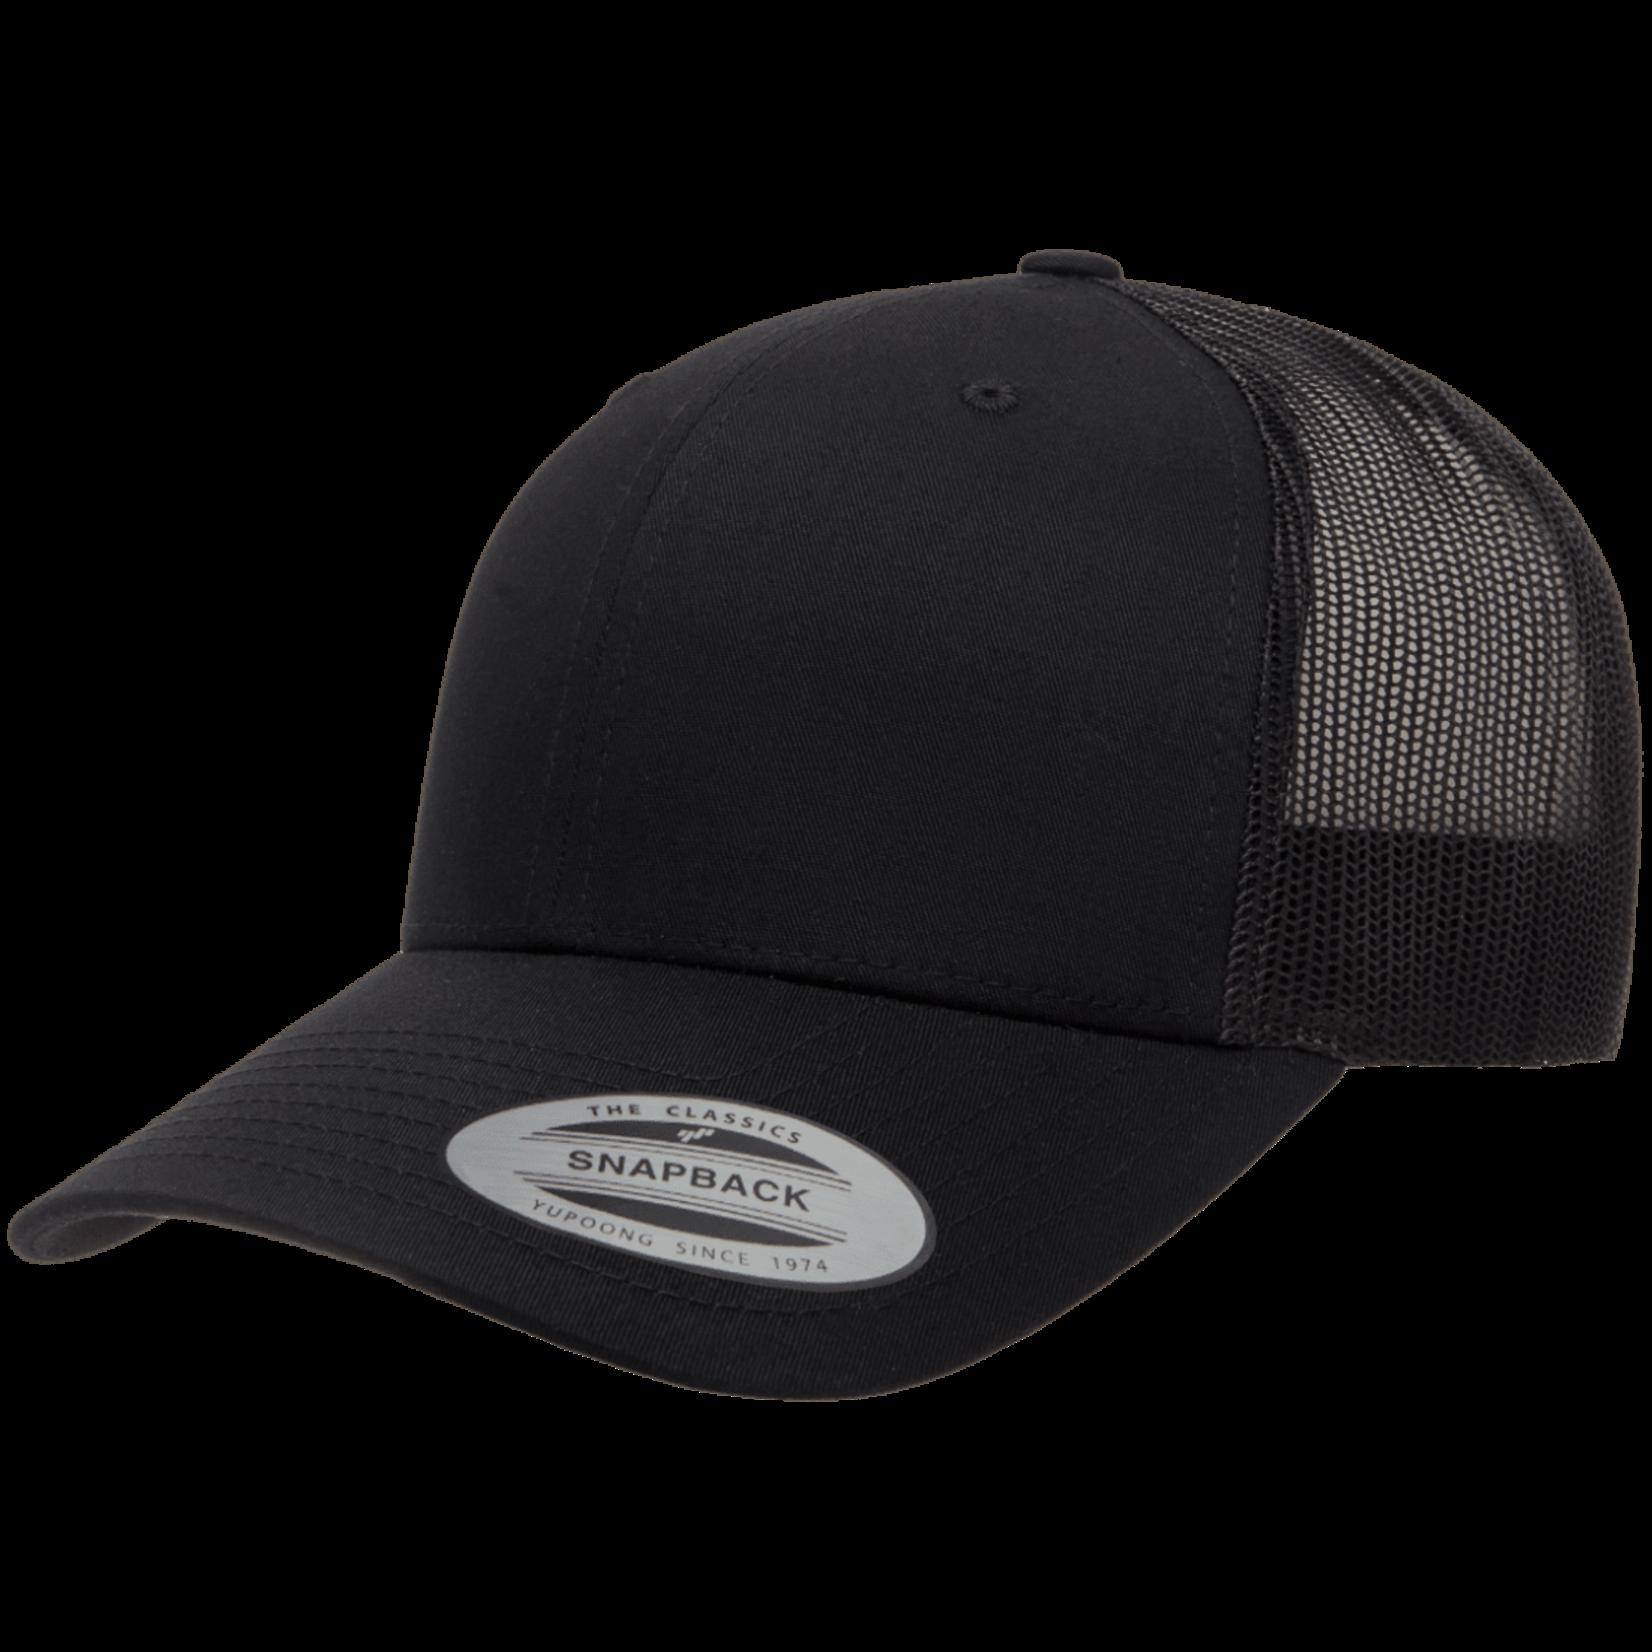 Flexfit Flexfit 6606 Classic Snapback Trucker Hat - Solid Black